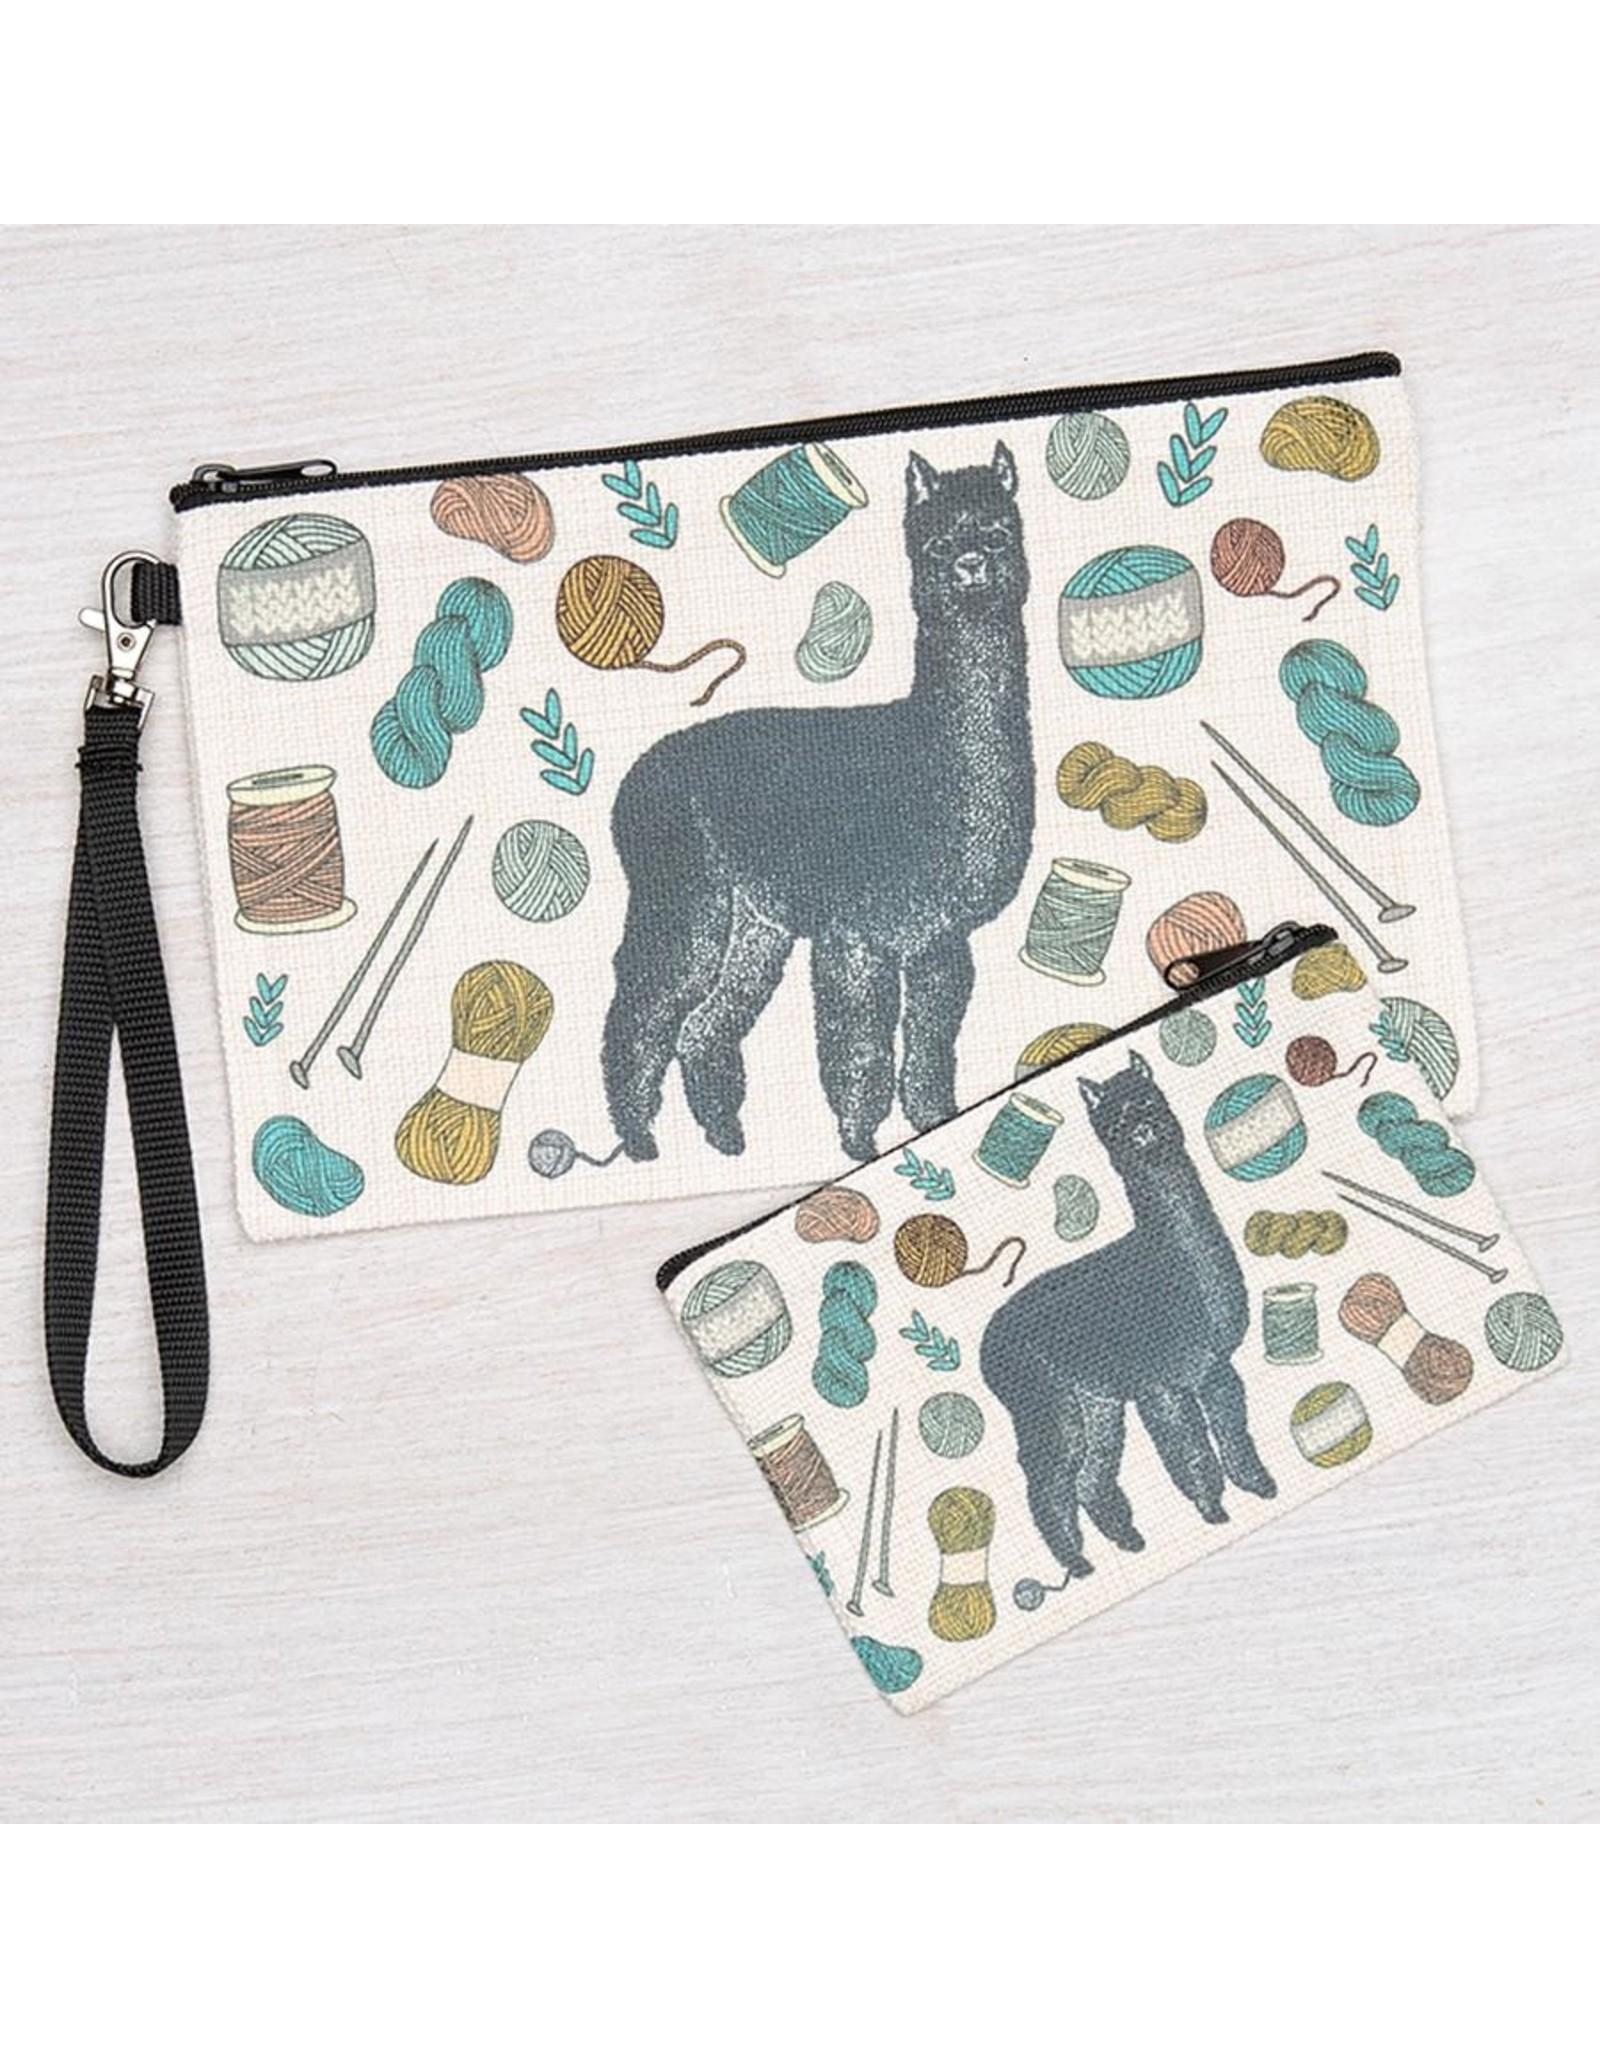 Counter Couture Alpaca Zipper Pouch-Large